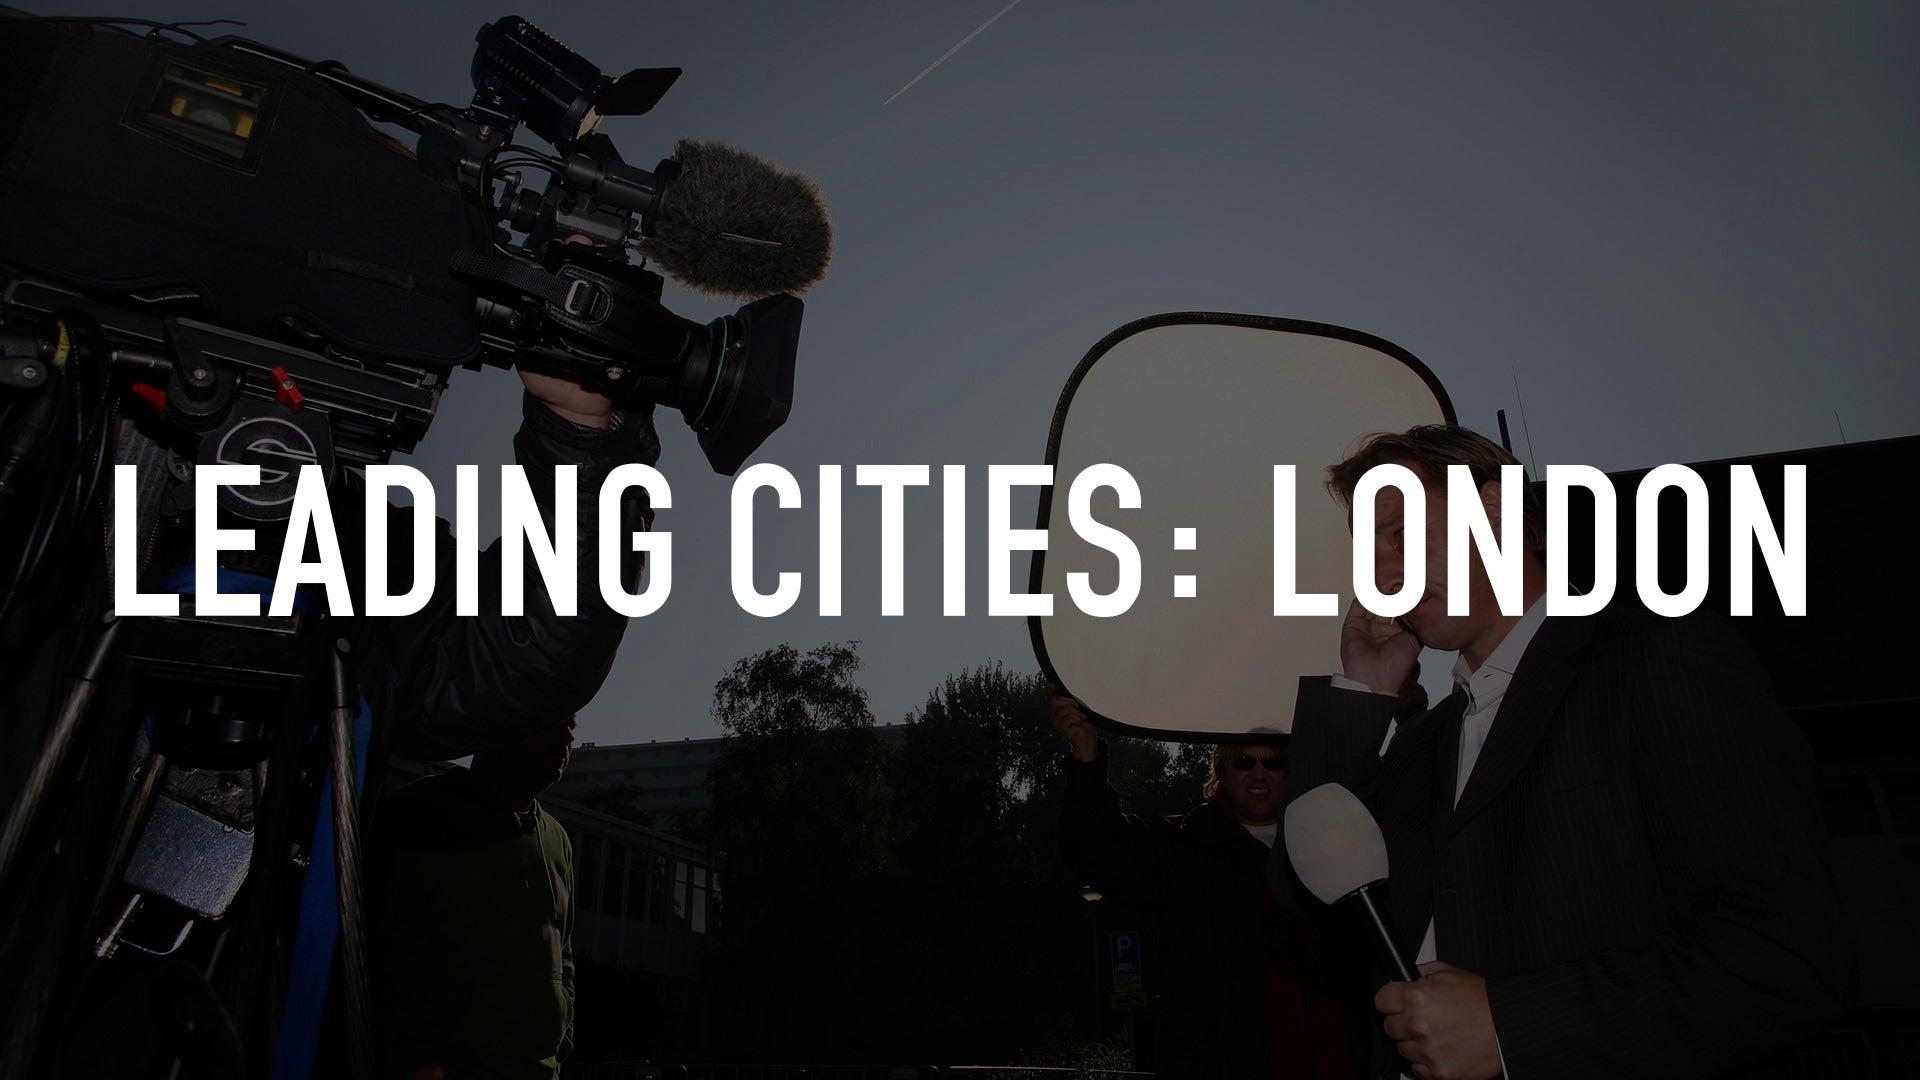 Leading Cities: London